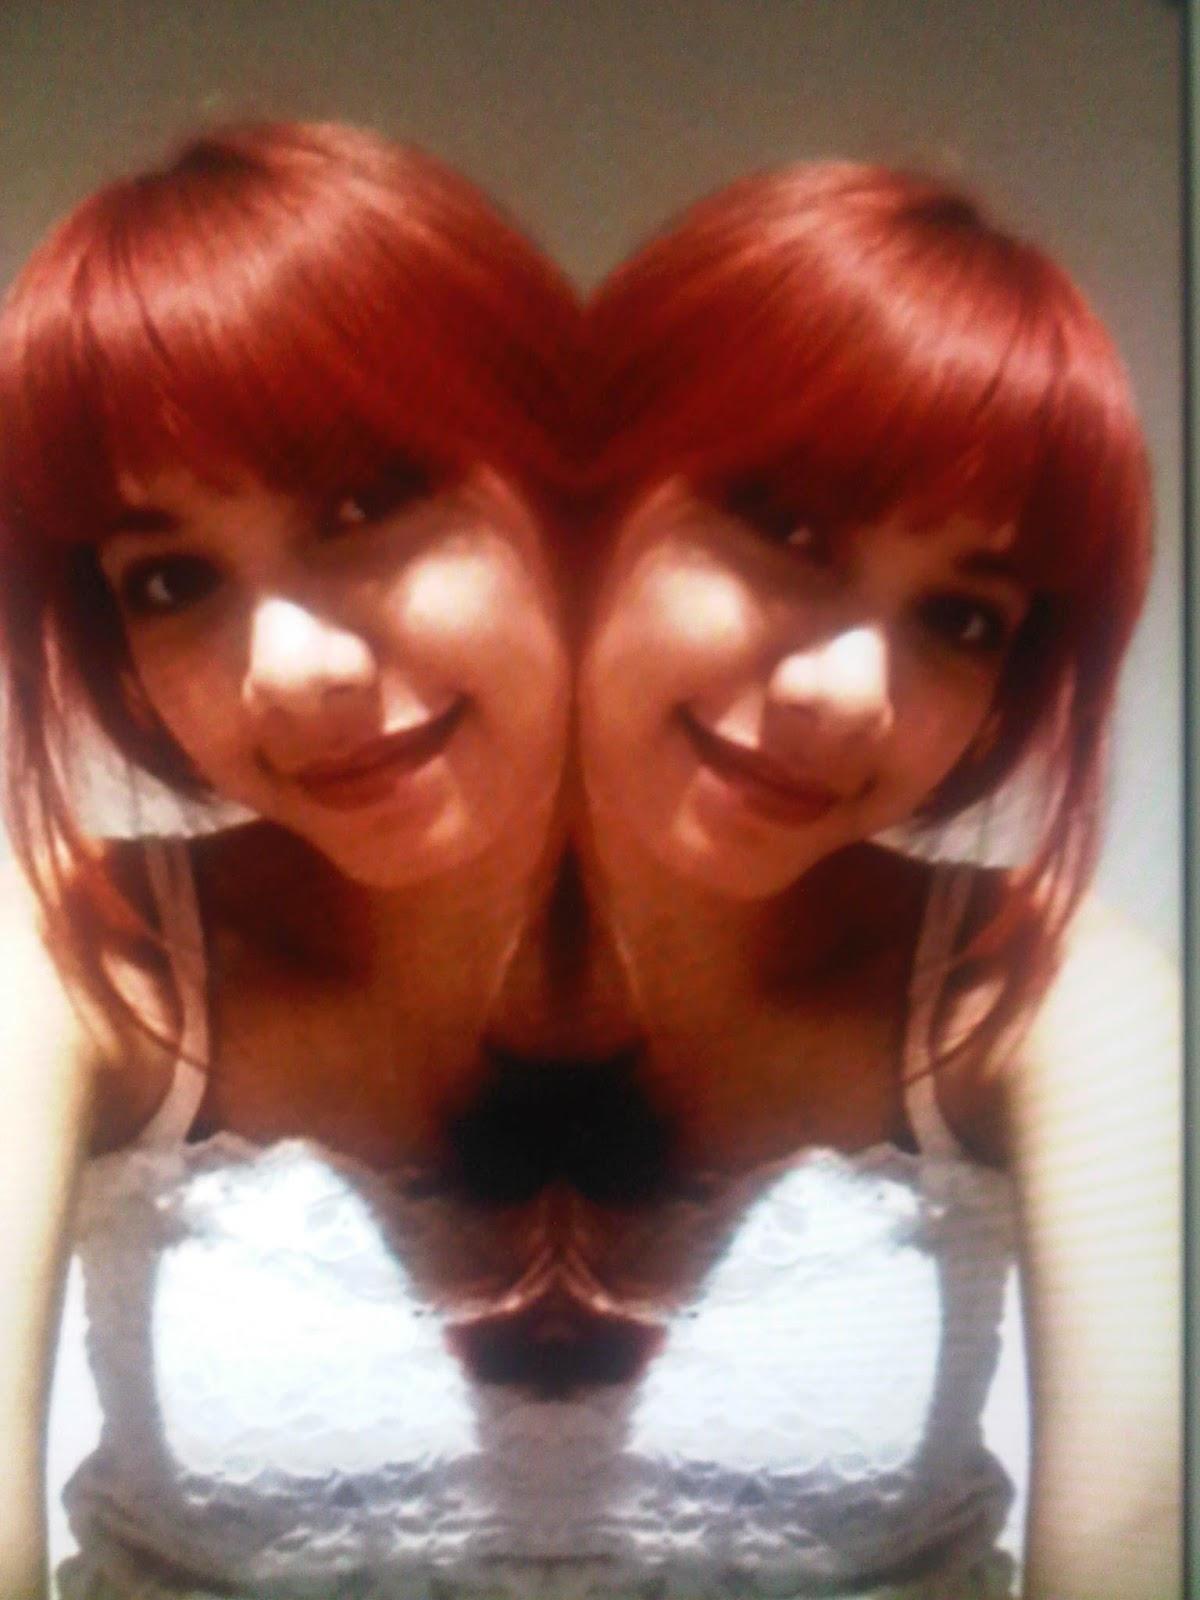 okira bexxa foto profil oky rizky sondara putri hanya